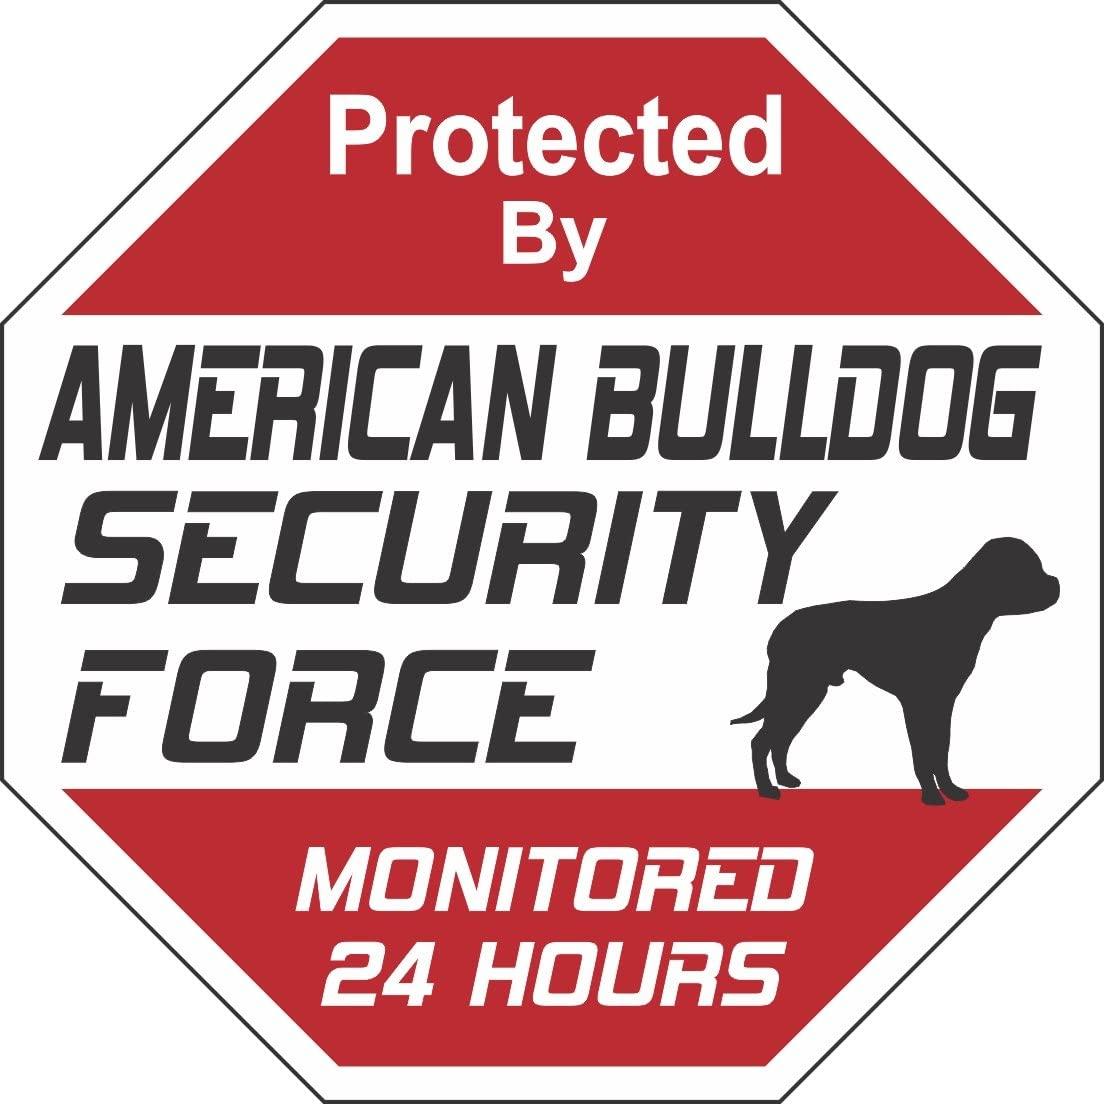 American Bulldog Dog Security Force Sign